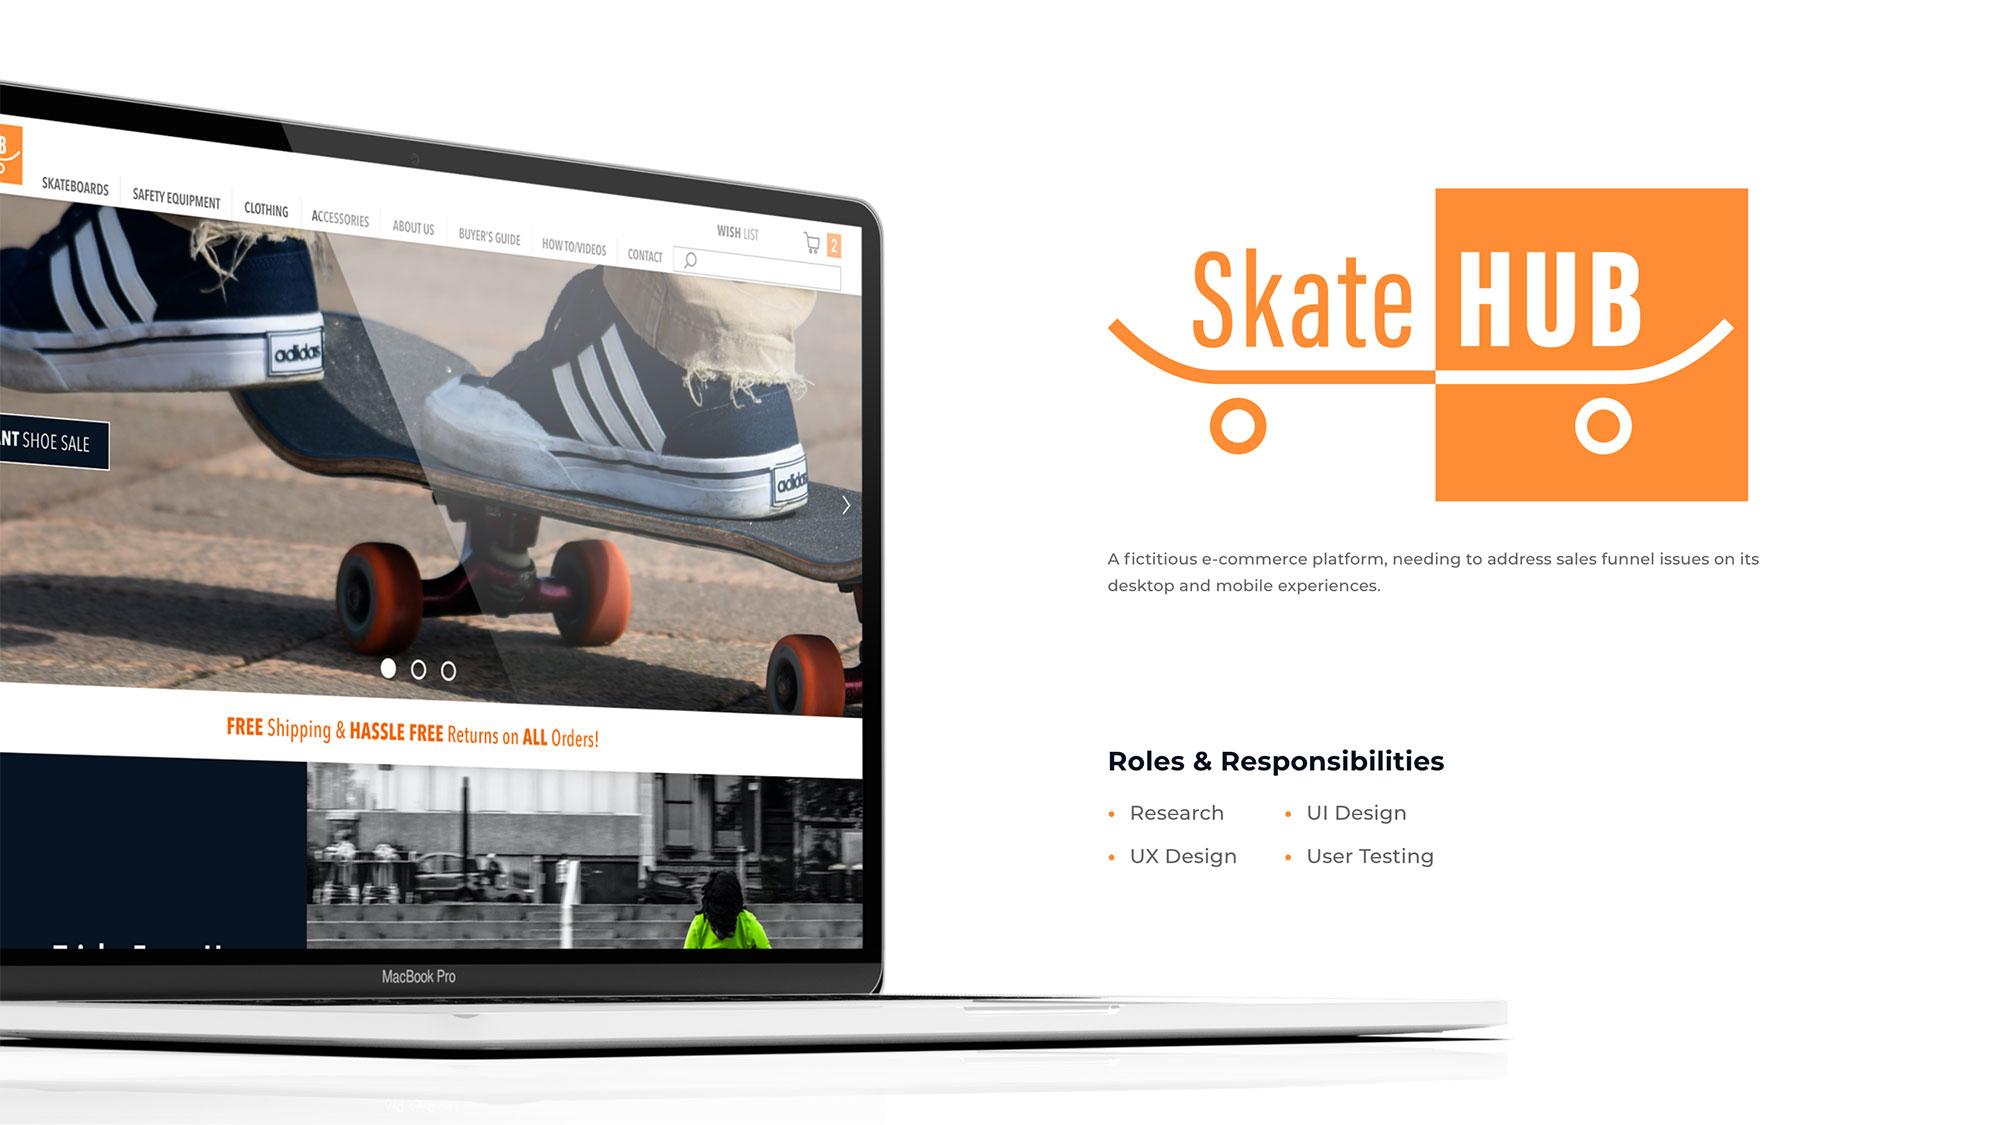 SkateHUB-Intro@3x